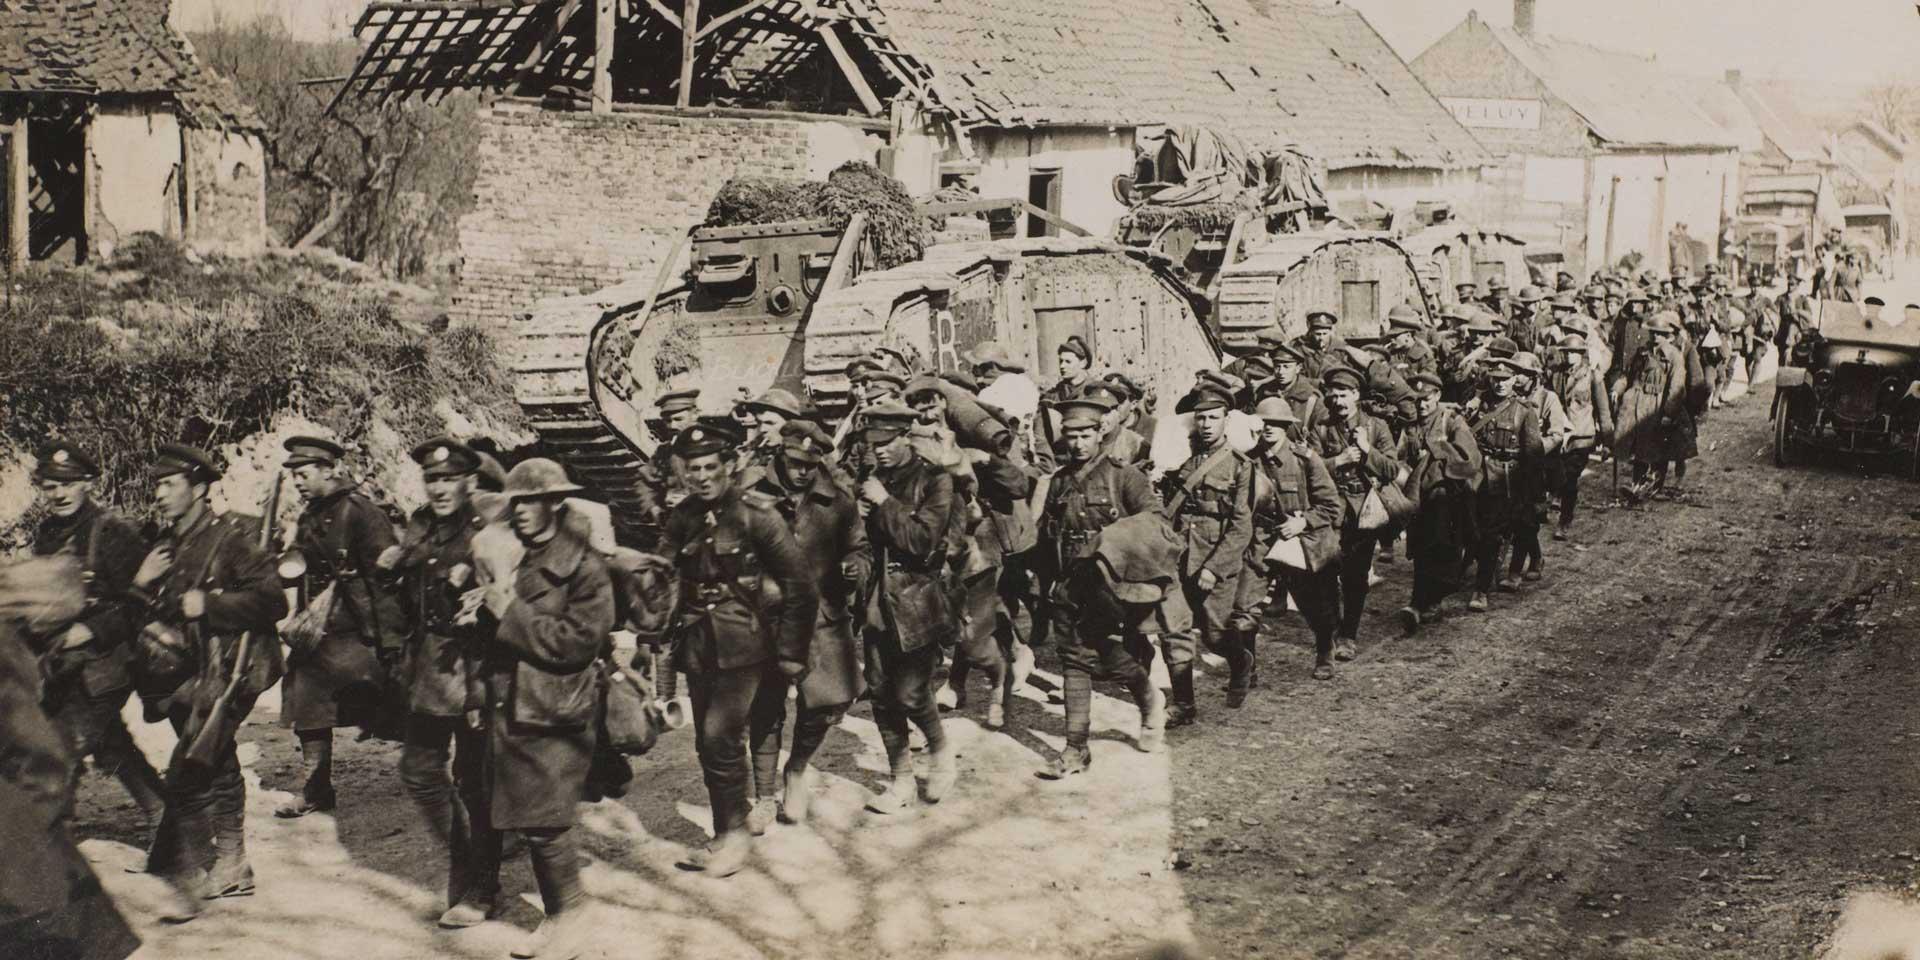 Troops passing tanks, 1918